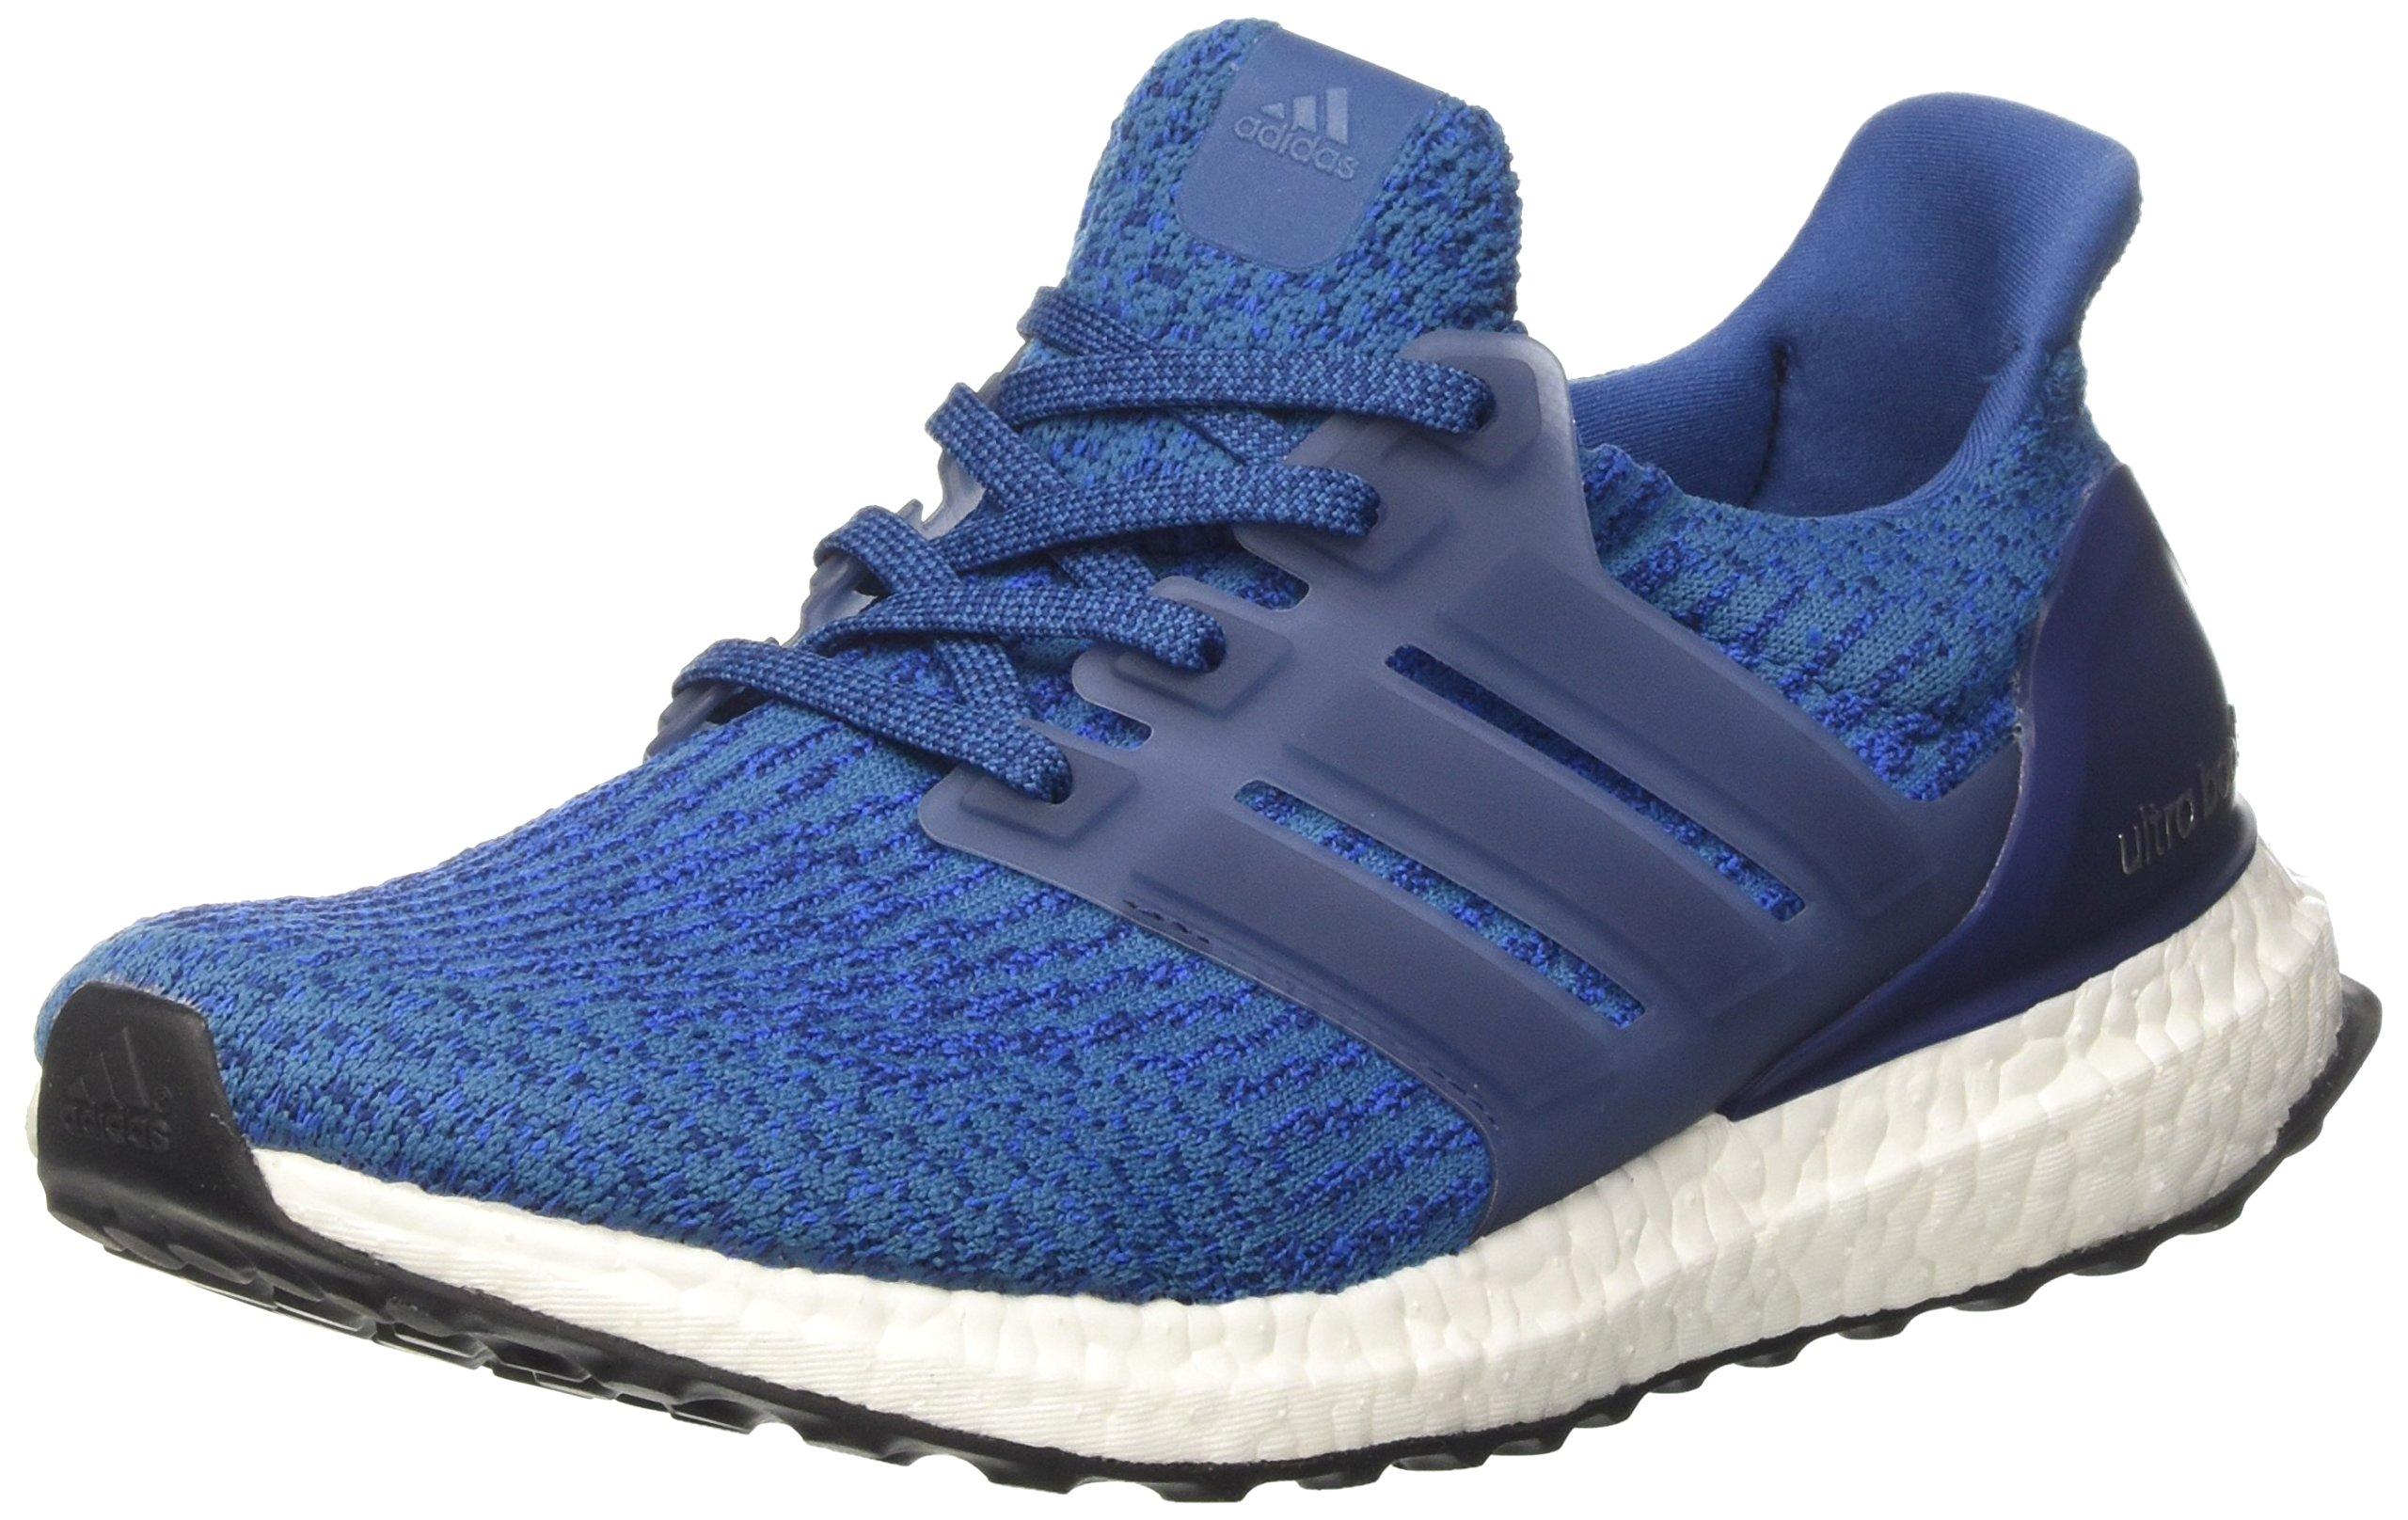 adidas Ultra Boost Running Shoes - SS17-10 - Blue